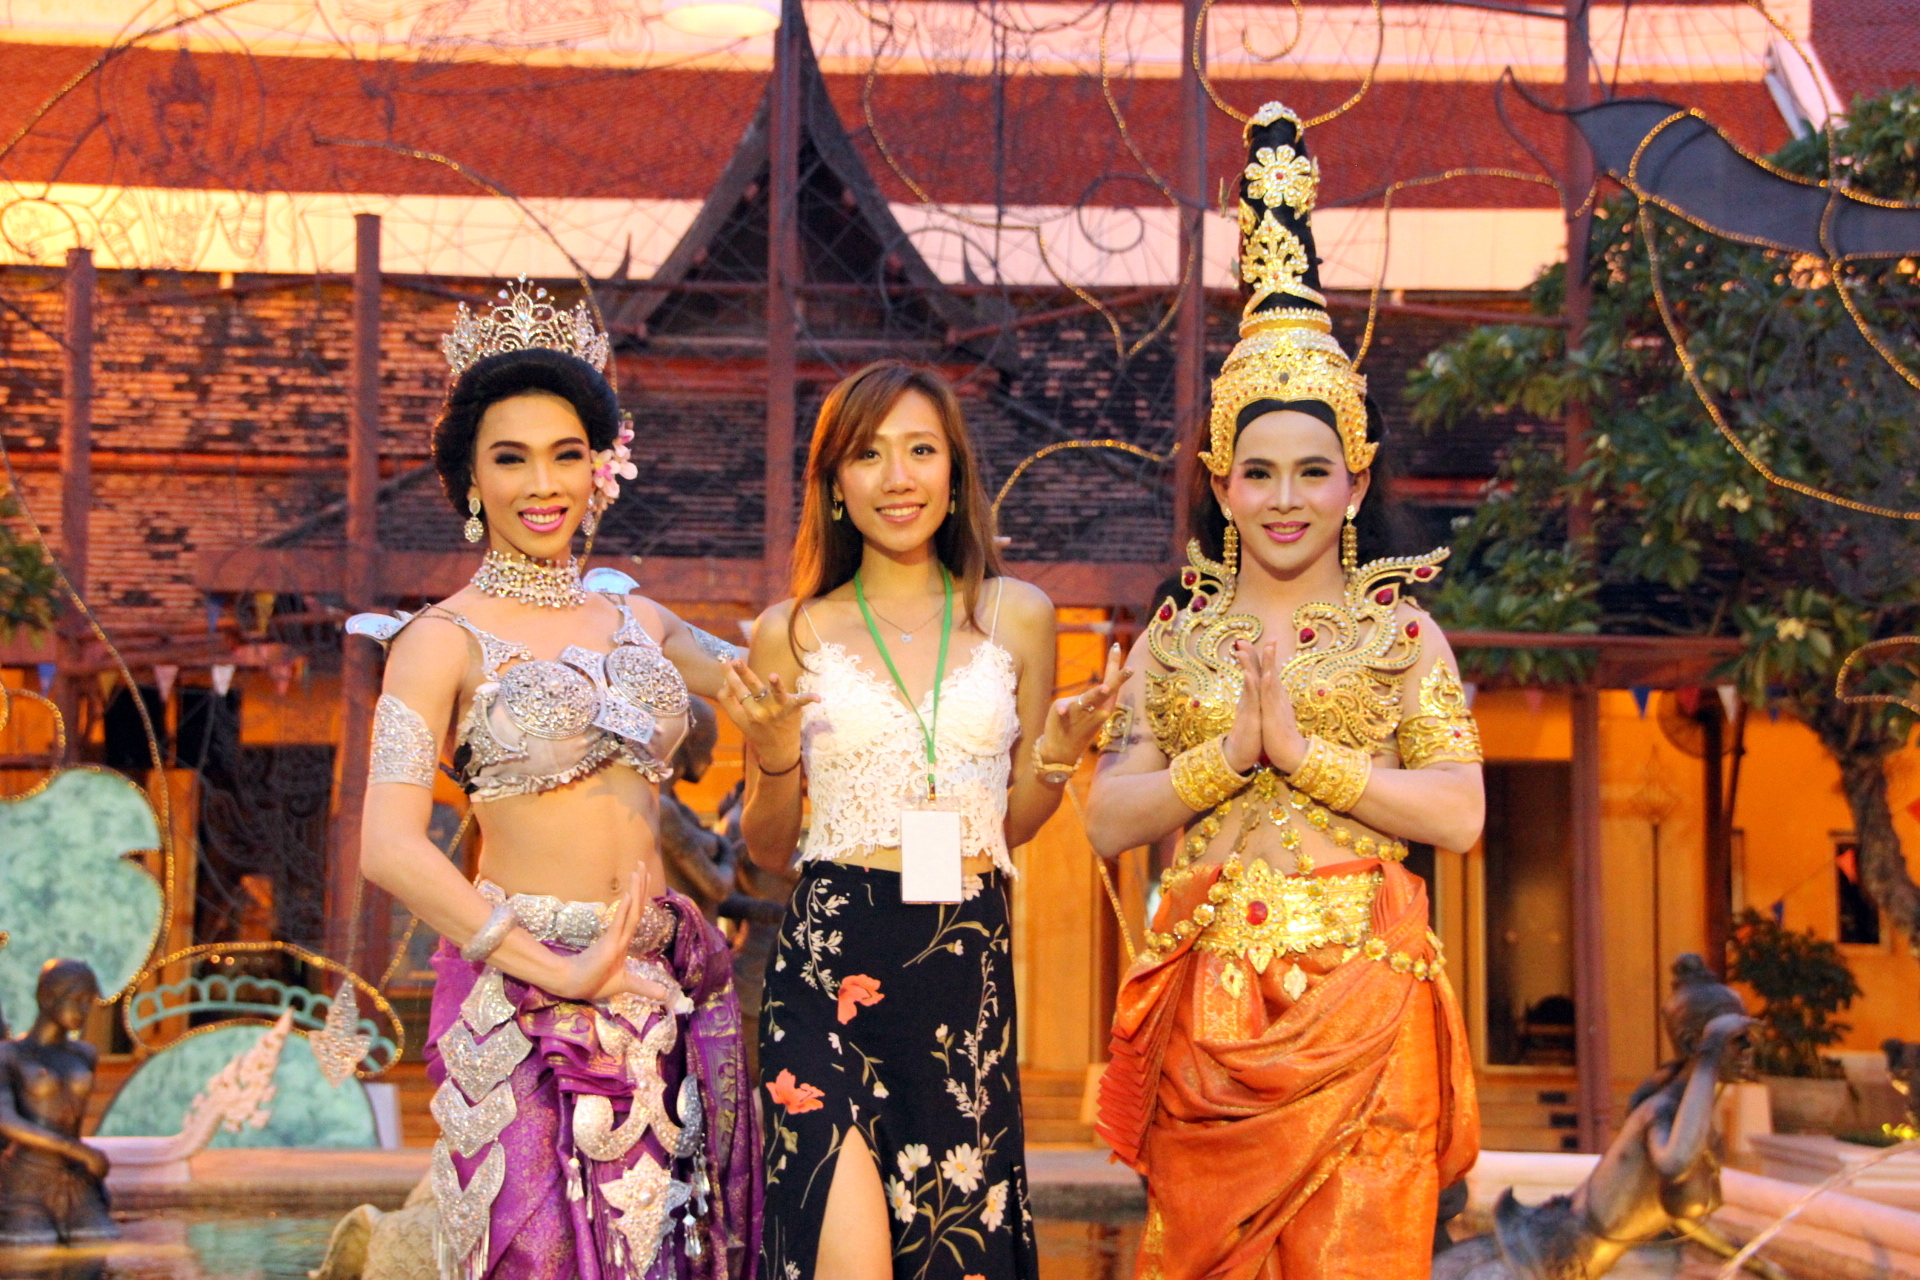 Siam Niramit stage